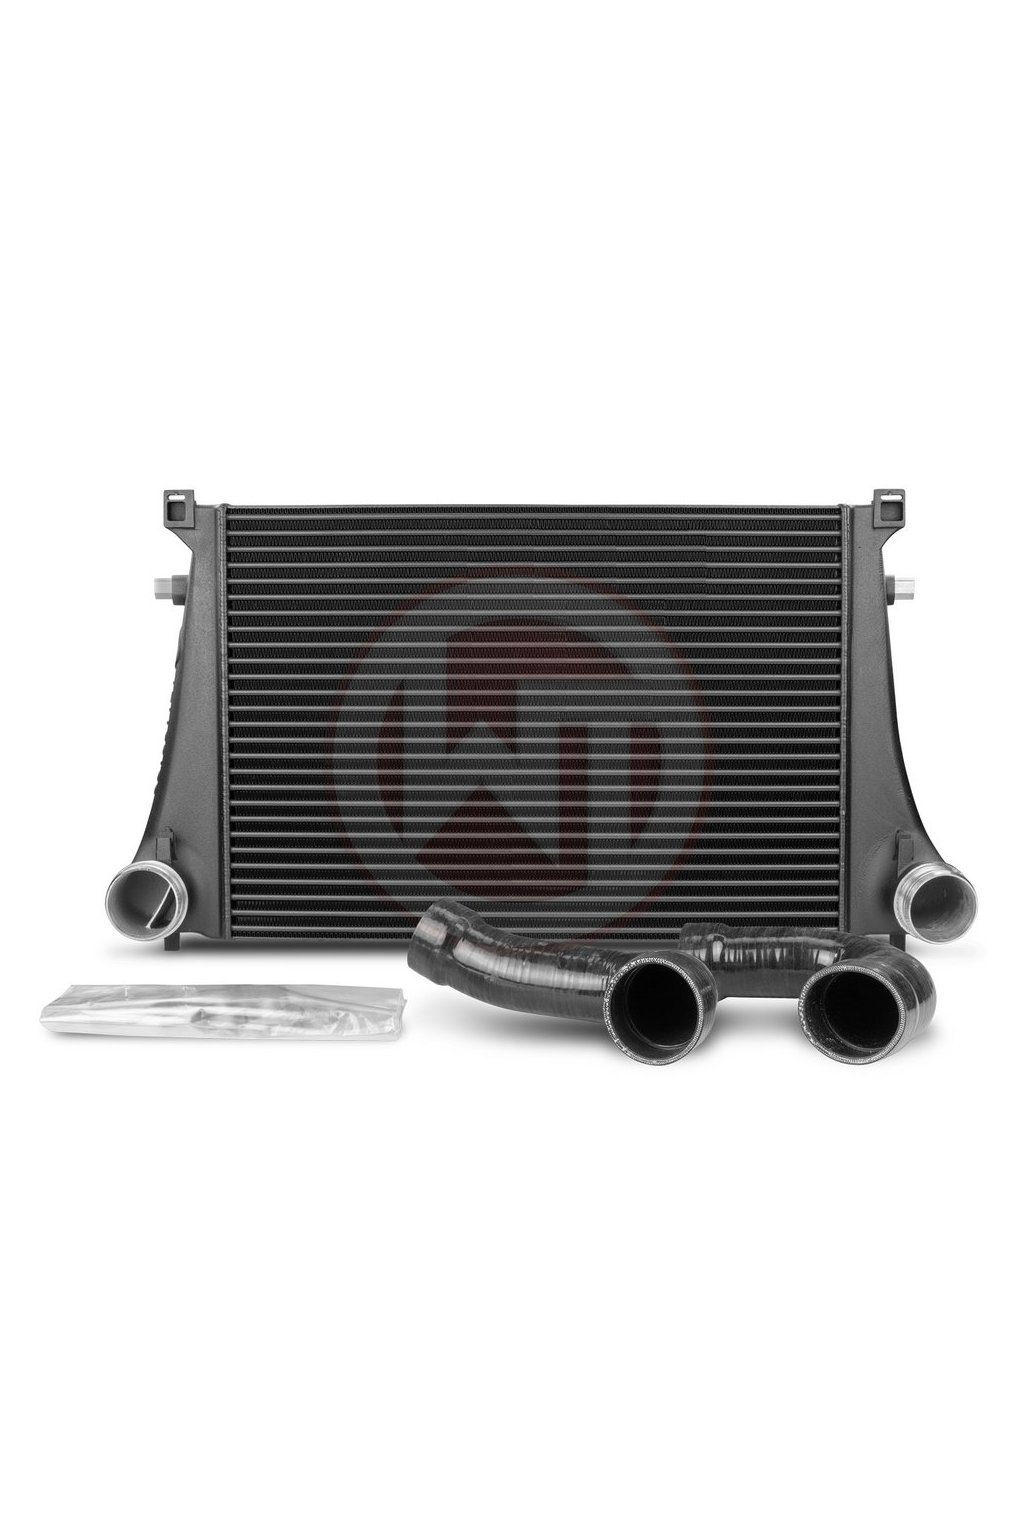 Wagner Tuning intercooler kit Octavia 4 RS / Golf 8 GTI 180KW